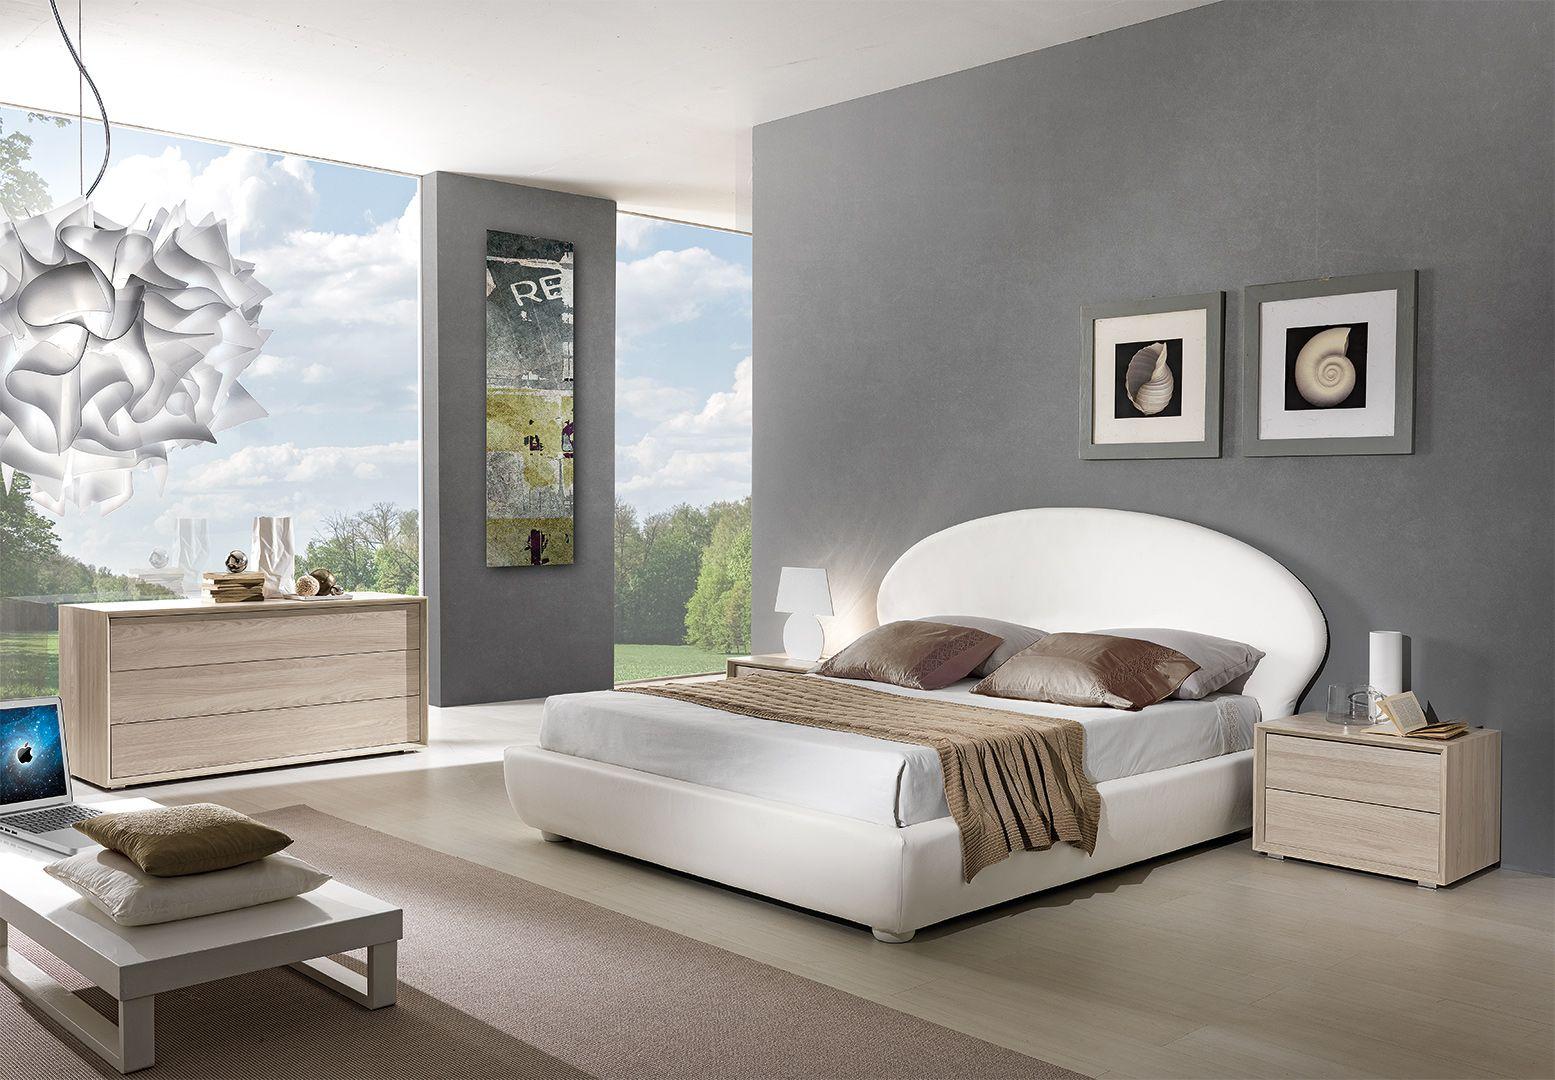 Essegiesse Mobili ~ Lepanto giessegi mobili cameras and bedrooms